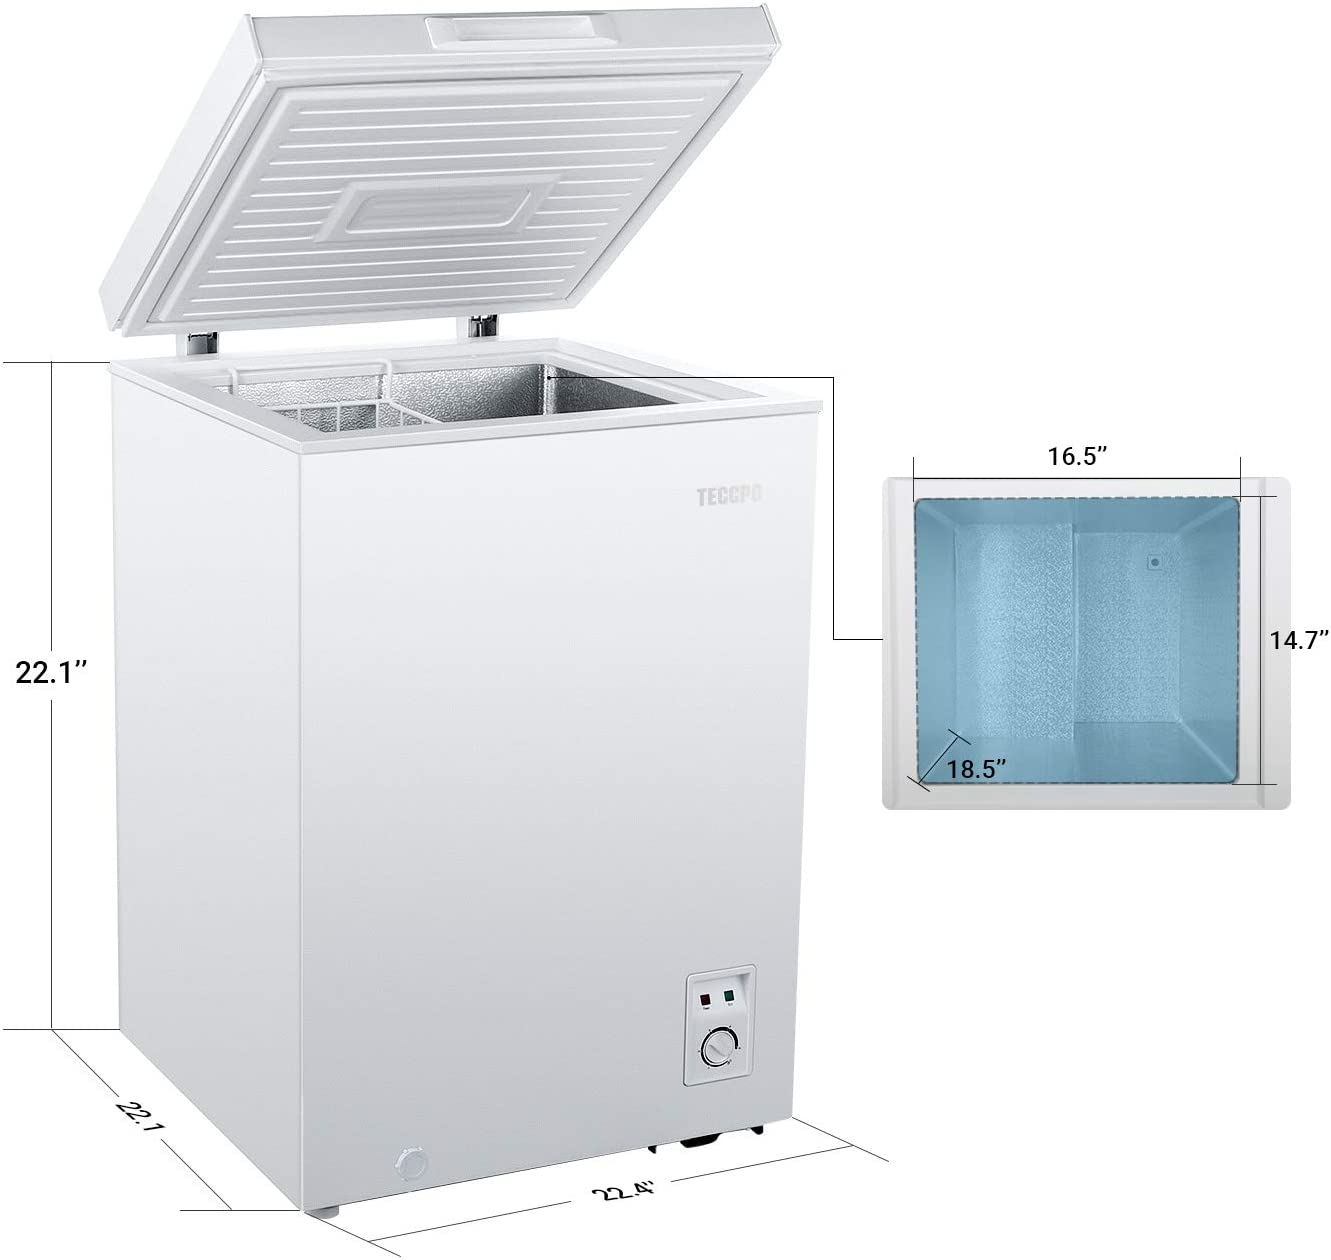 TECCPO Chest Freezer 3.5 Cu Ft  Specs